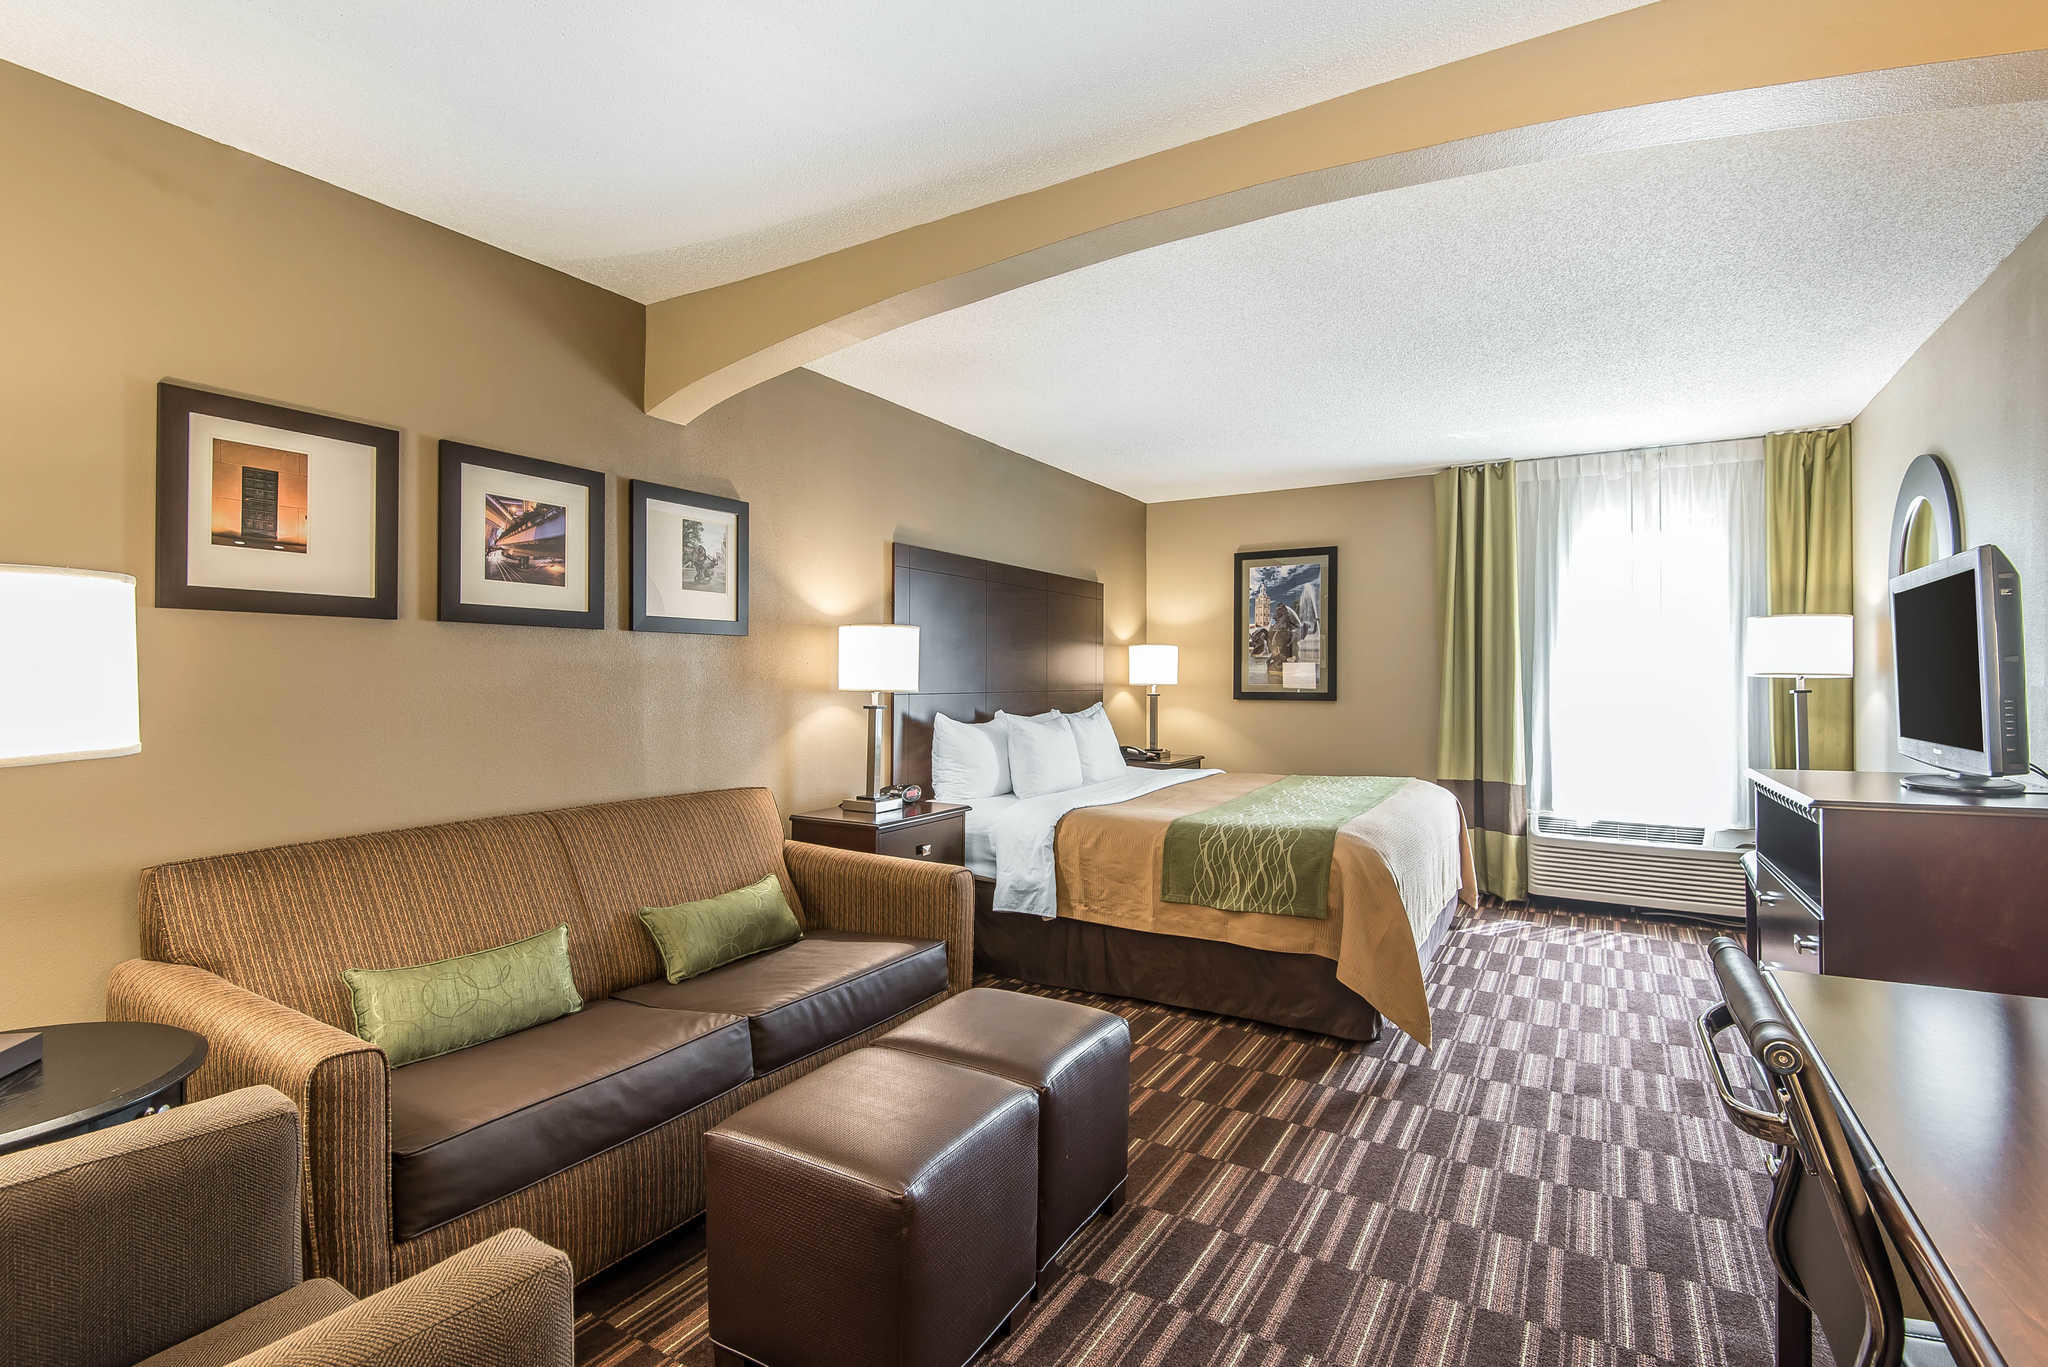 Comfort Inn & Suites Kansas City - Northeast image 22